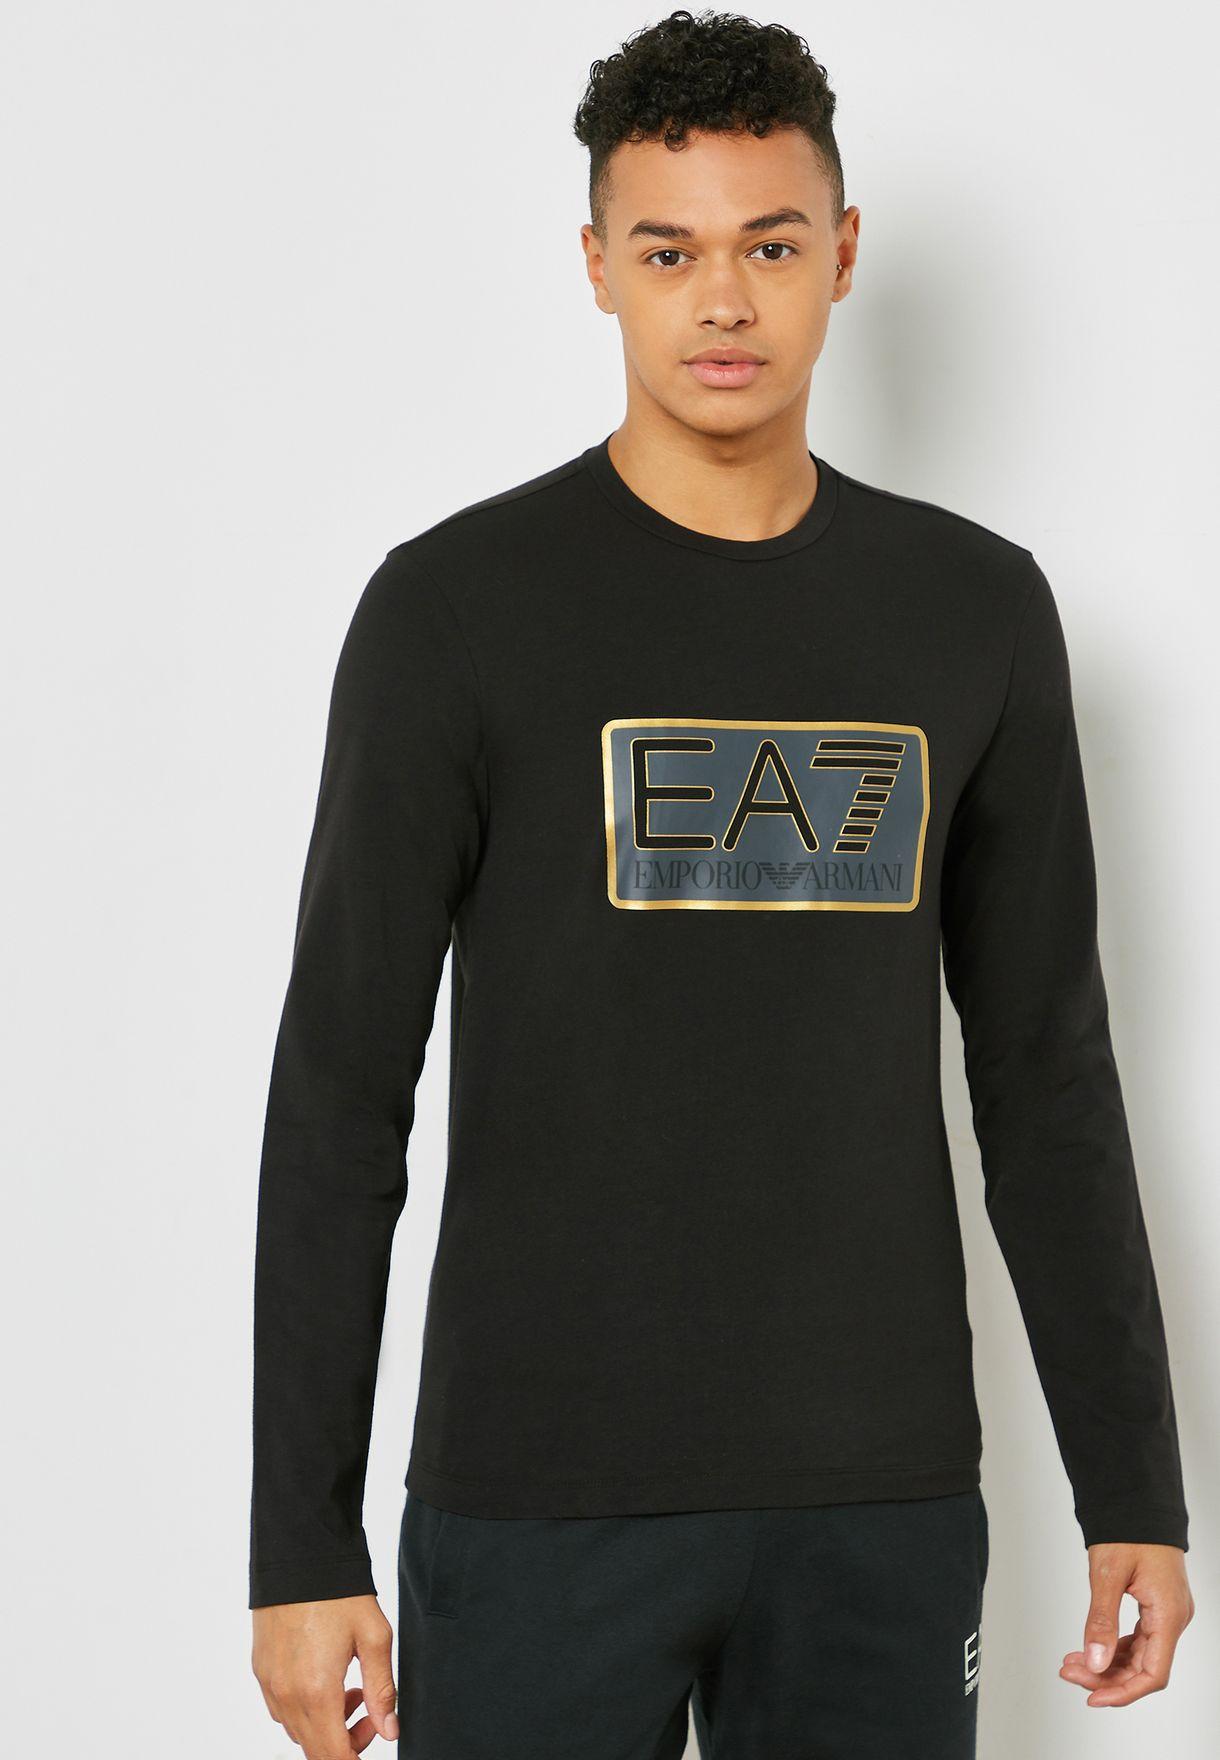 6dad4217 Shop Ea7 Emporio Armani black Train Visibility Crew Neck T-Shirt ...